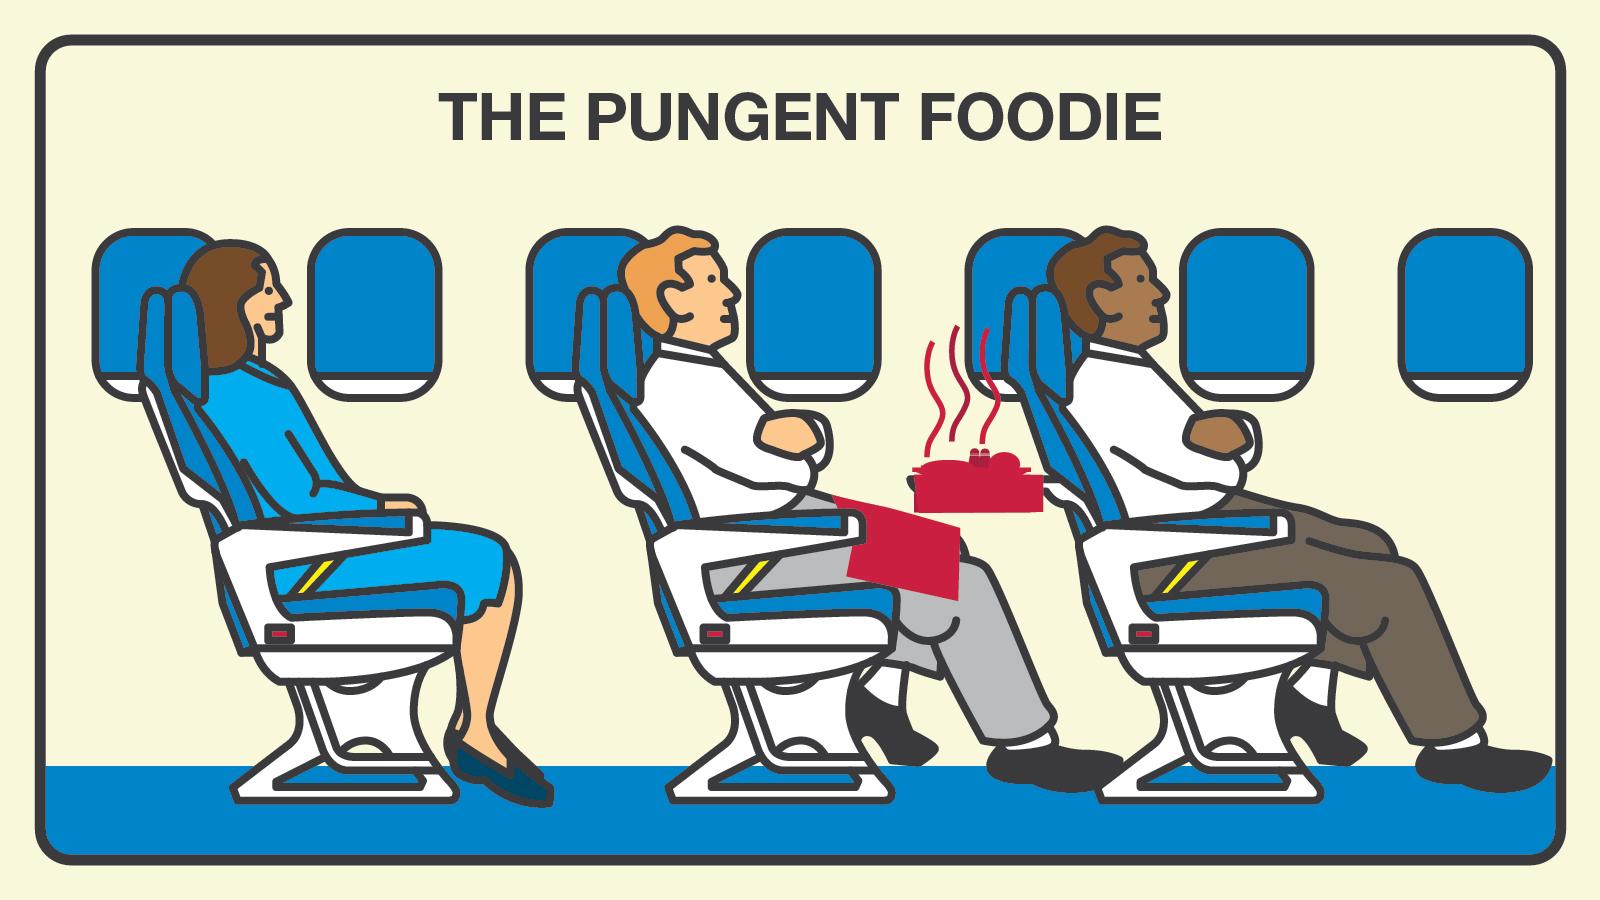 Pleasant Window Seat Or Aisle Seat Cnn Staffers Debate Airplane Ibusinesslaw Wood Chair Design Ideas Ibusinesslaworg